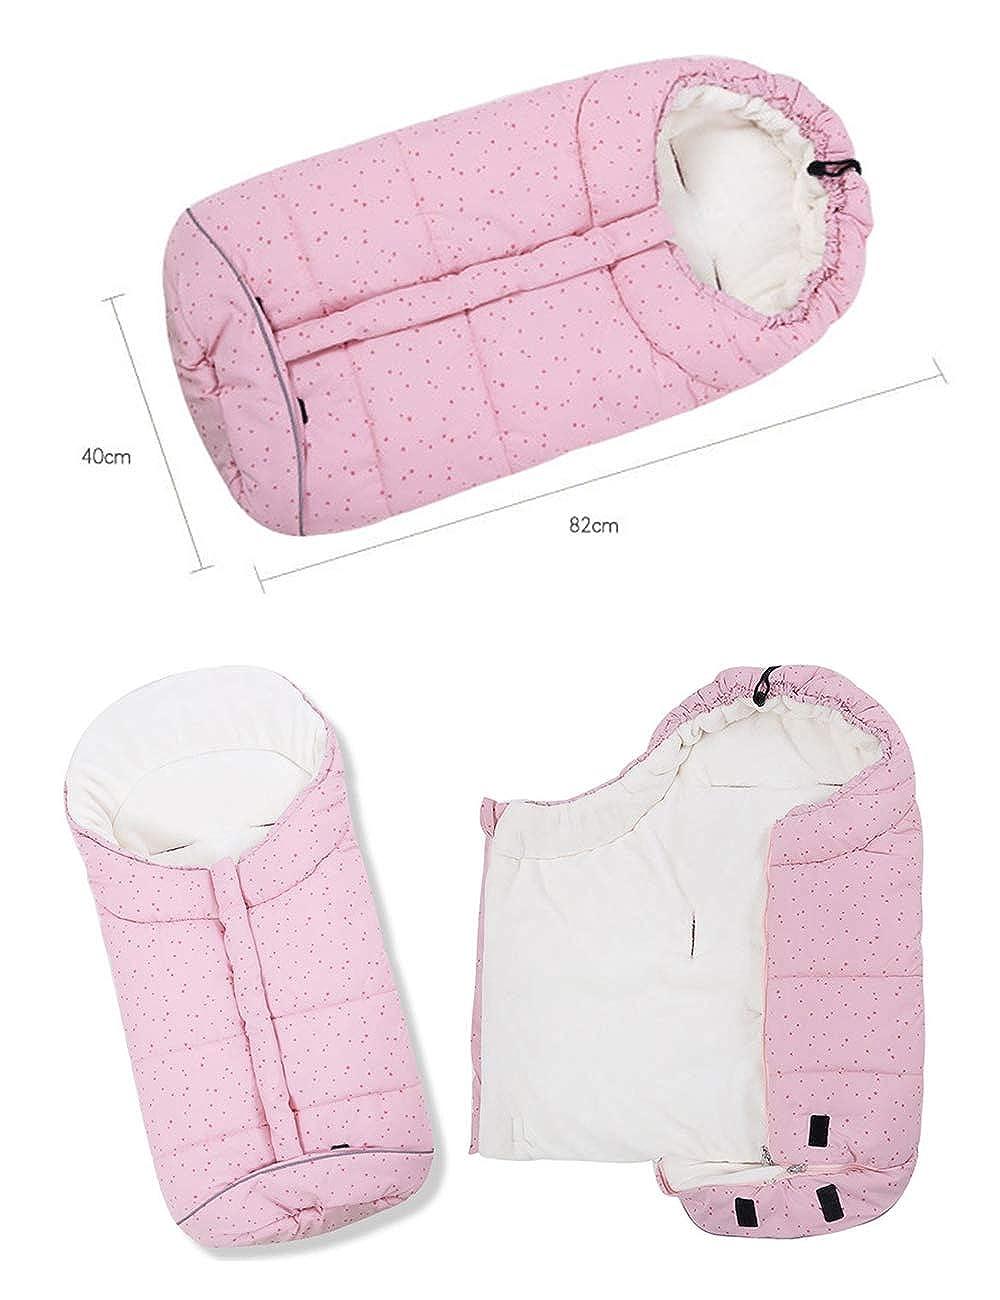 Forro Polar Impermeable Saco de Paseo Resistente contra el Viento para Ni/ños Ni/ña BESBOMIG Saco de Dormir Unisex para Cochecito de Beb/é Universal